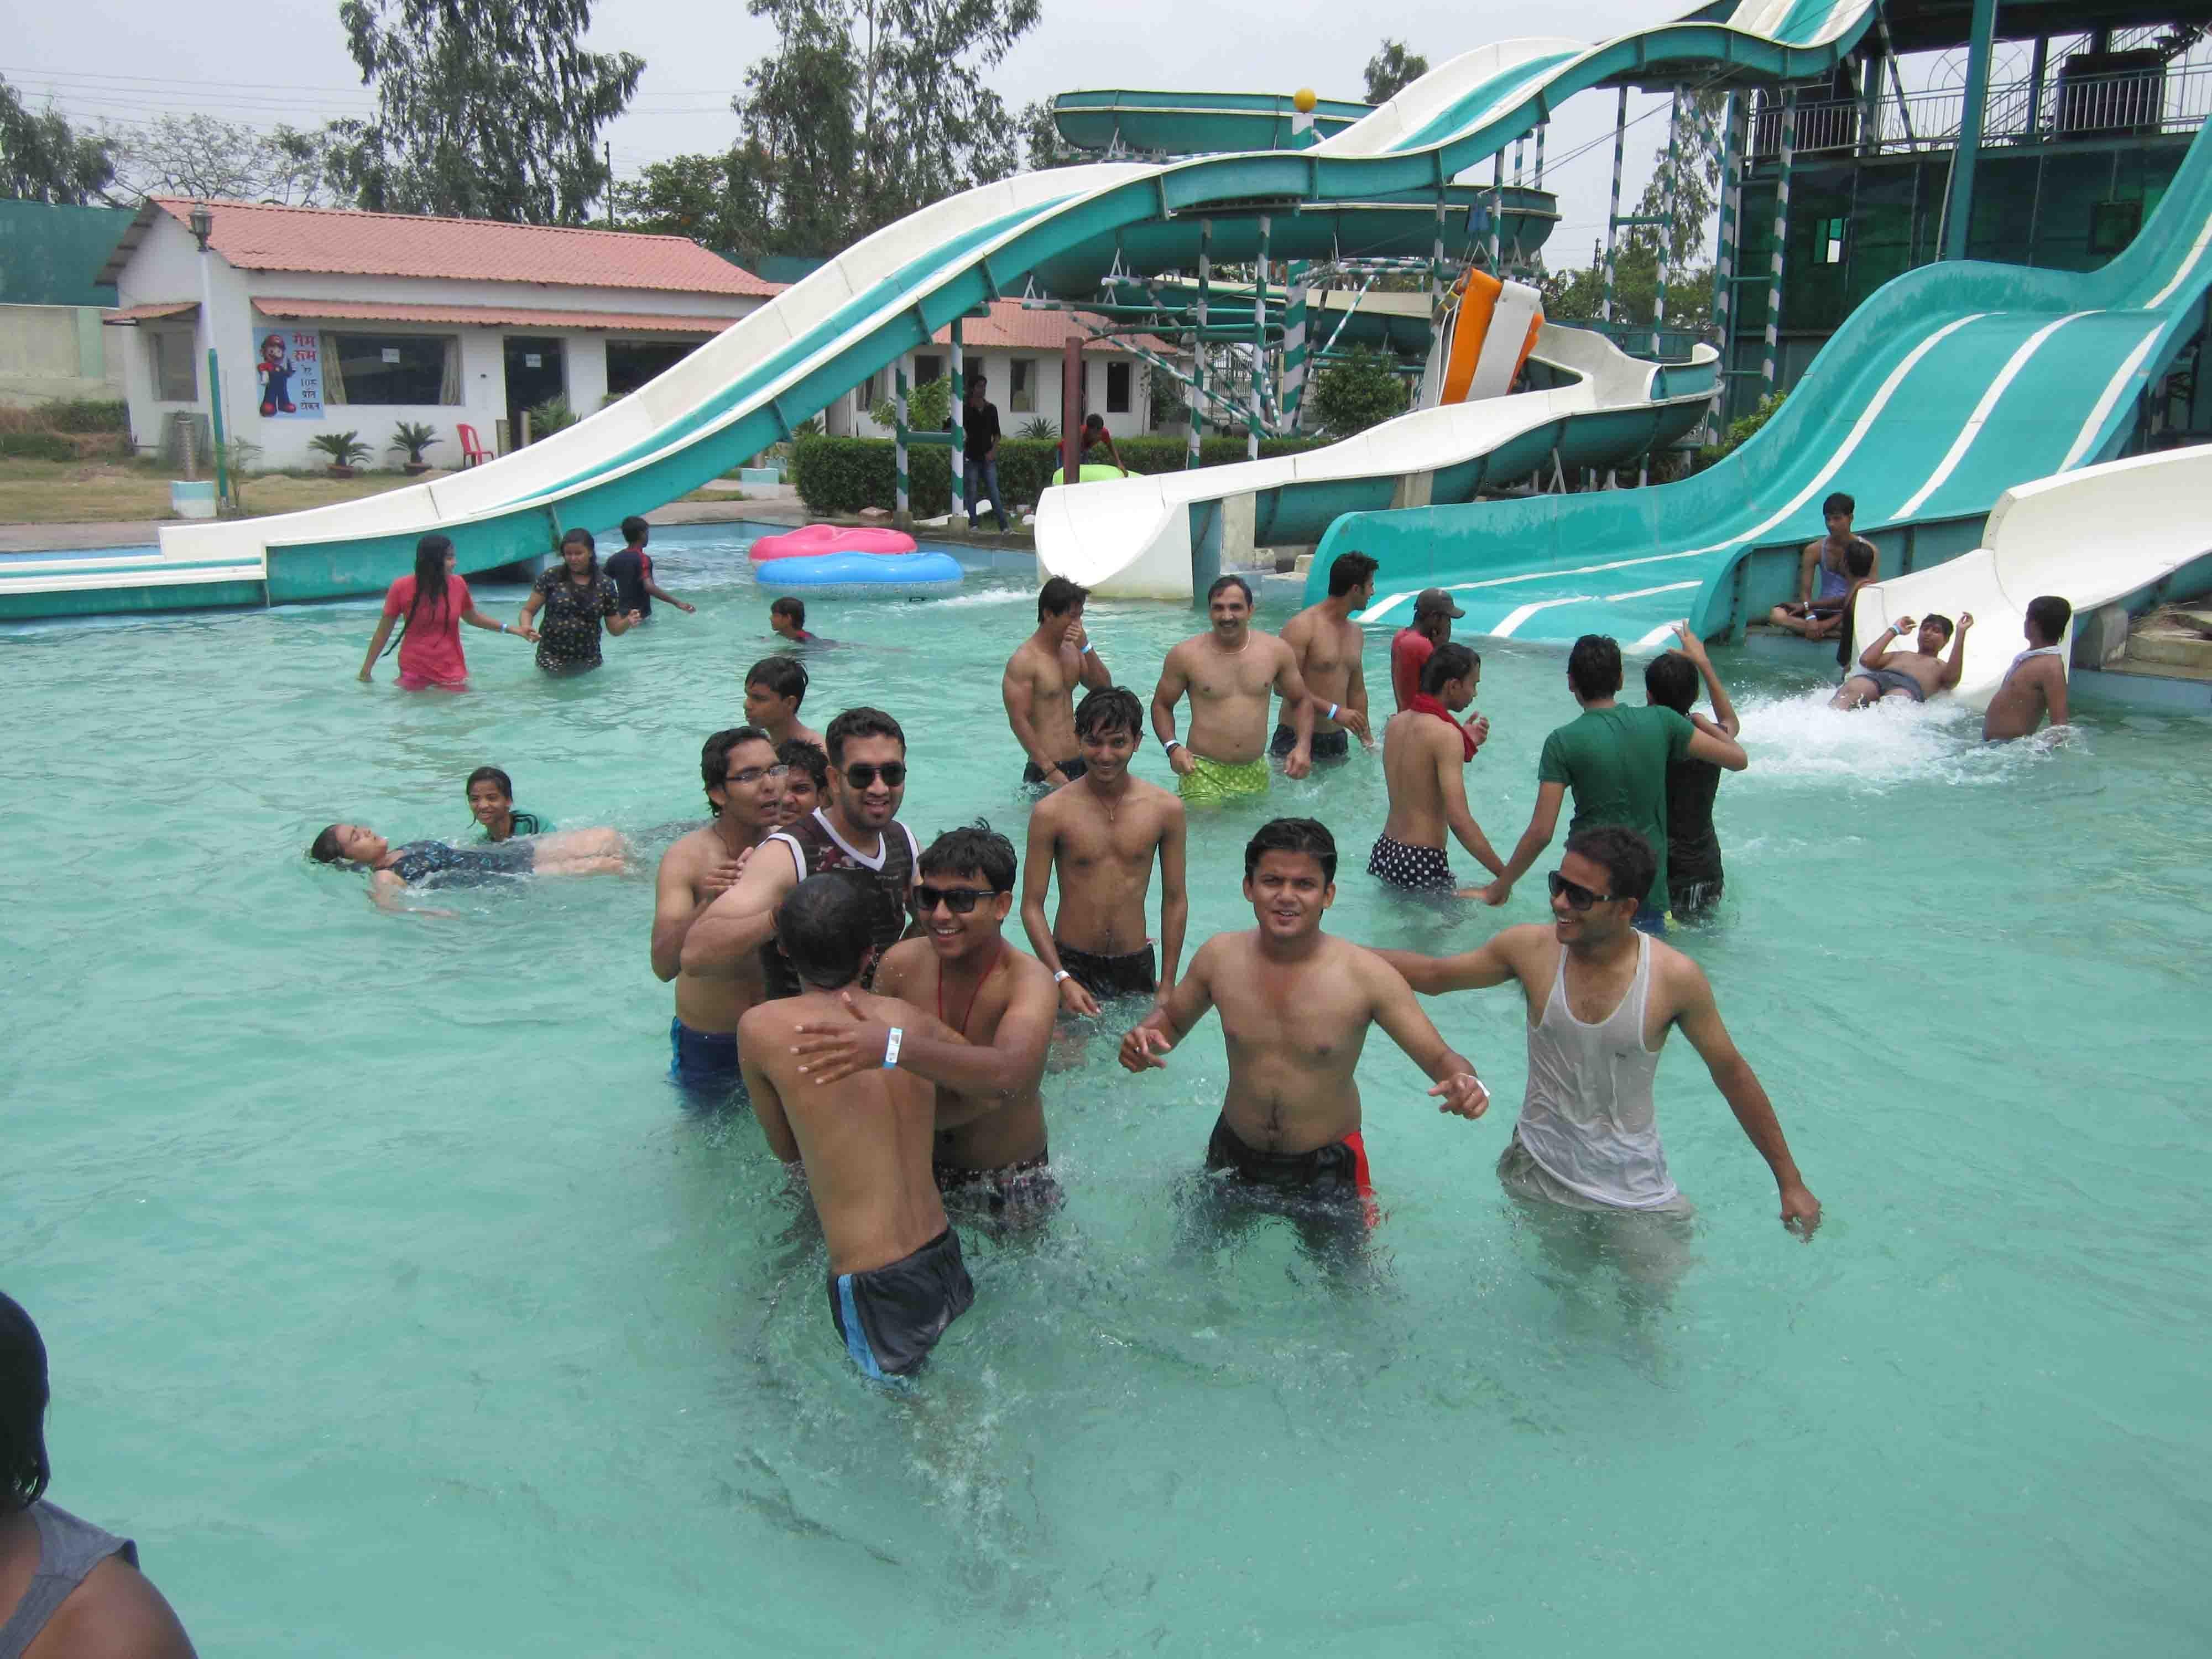 juegos de piscinas de agua gratis